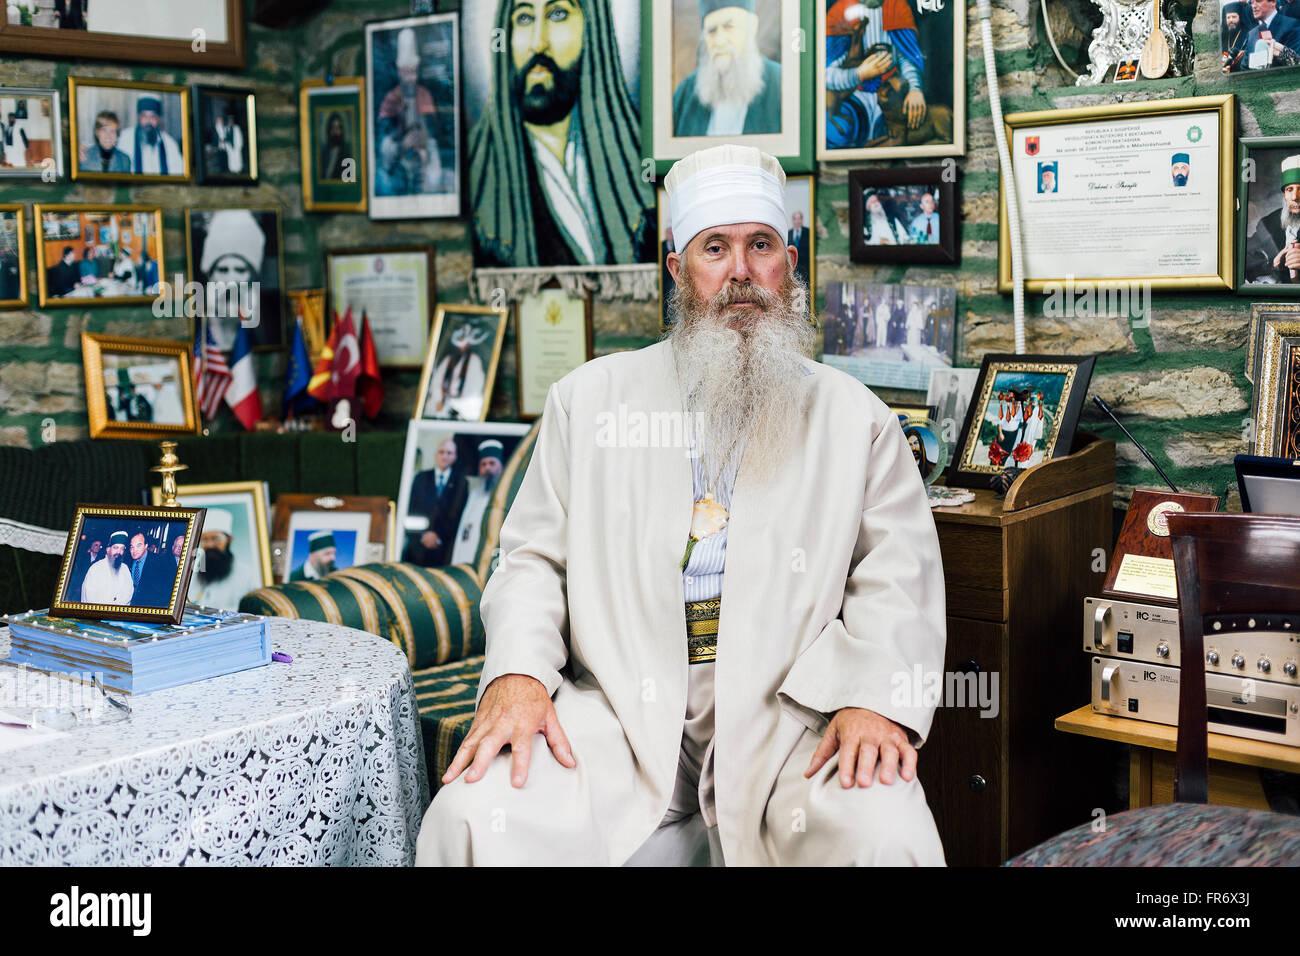 Republic of Macedonia, Tetovo, Portrait of the Dervish Muttalib from Tetovo sufism communauty - Stock Image